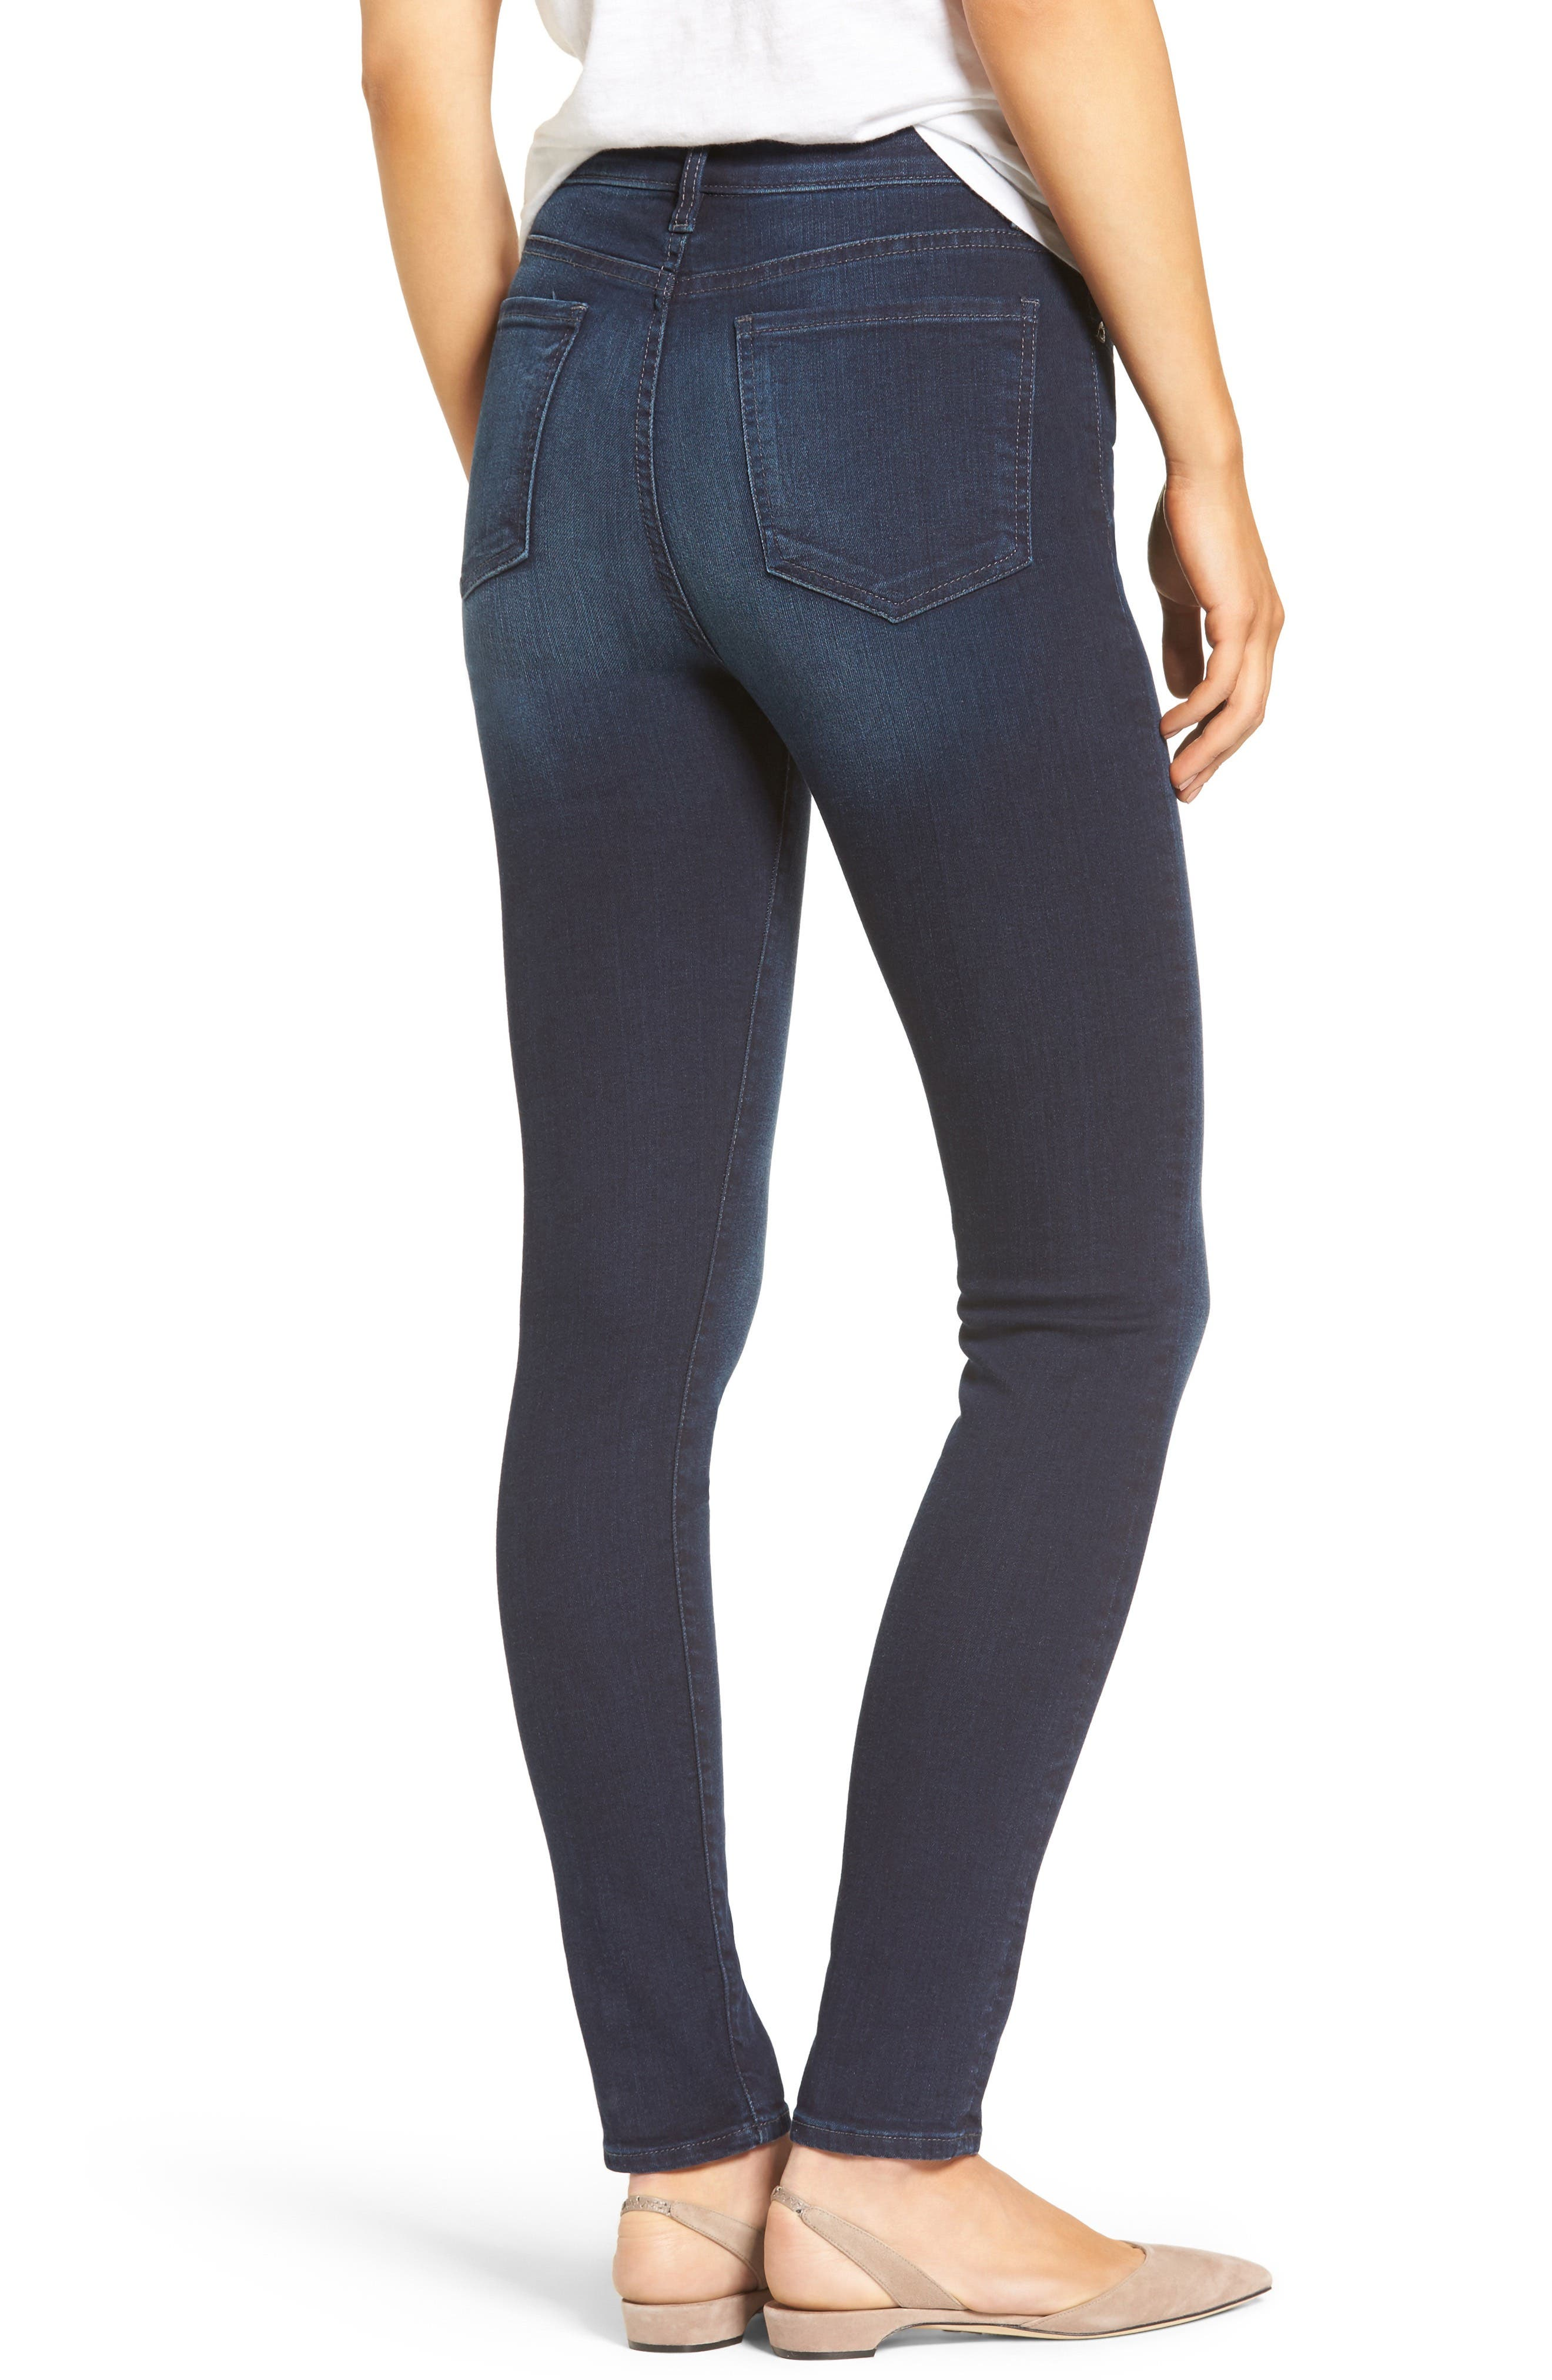 Mia High Waist Skinny Jeans,                             Alternate thumbnail 2, color,